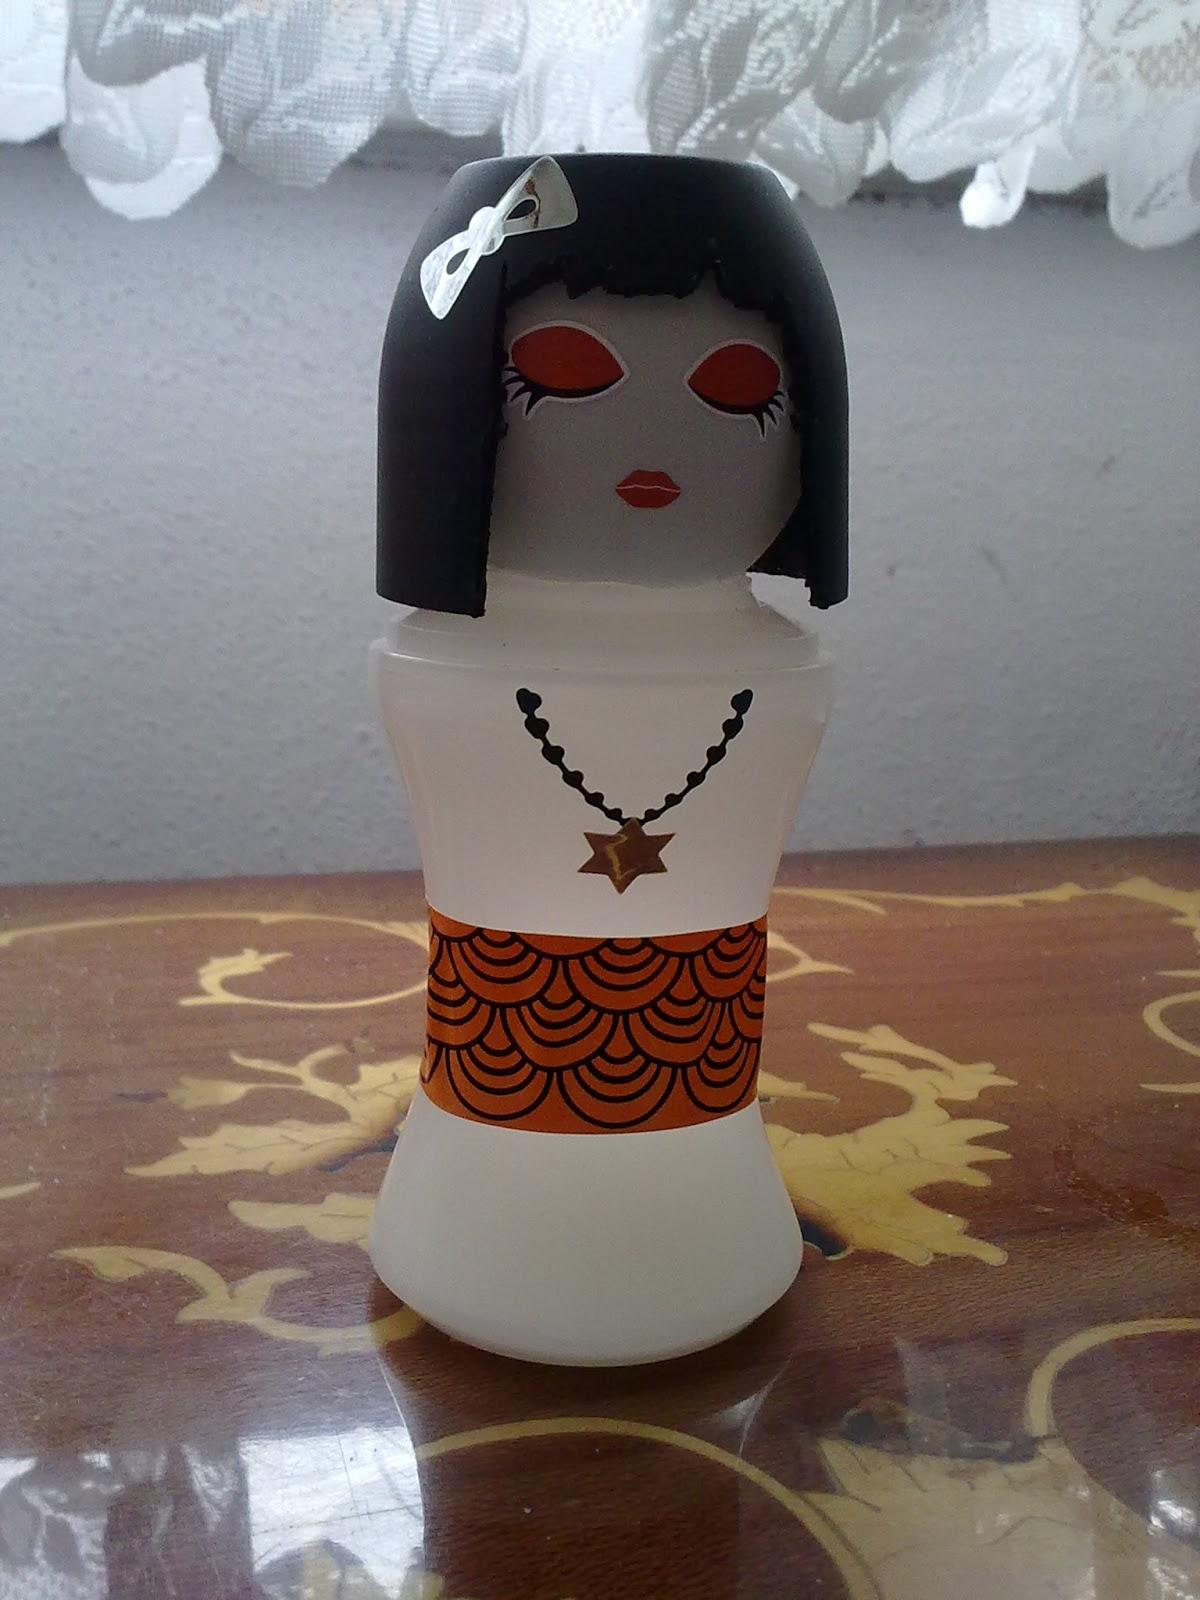 -http://1.bp.blogspot.com/-HtW-wrvhto8/USTIeF8-JtI/AAAAAAAAAdY/mbXTITUwyHo/s1600/kokeshi+bebekleri.jpg